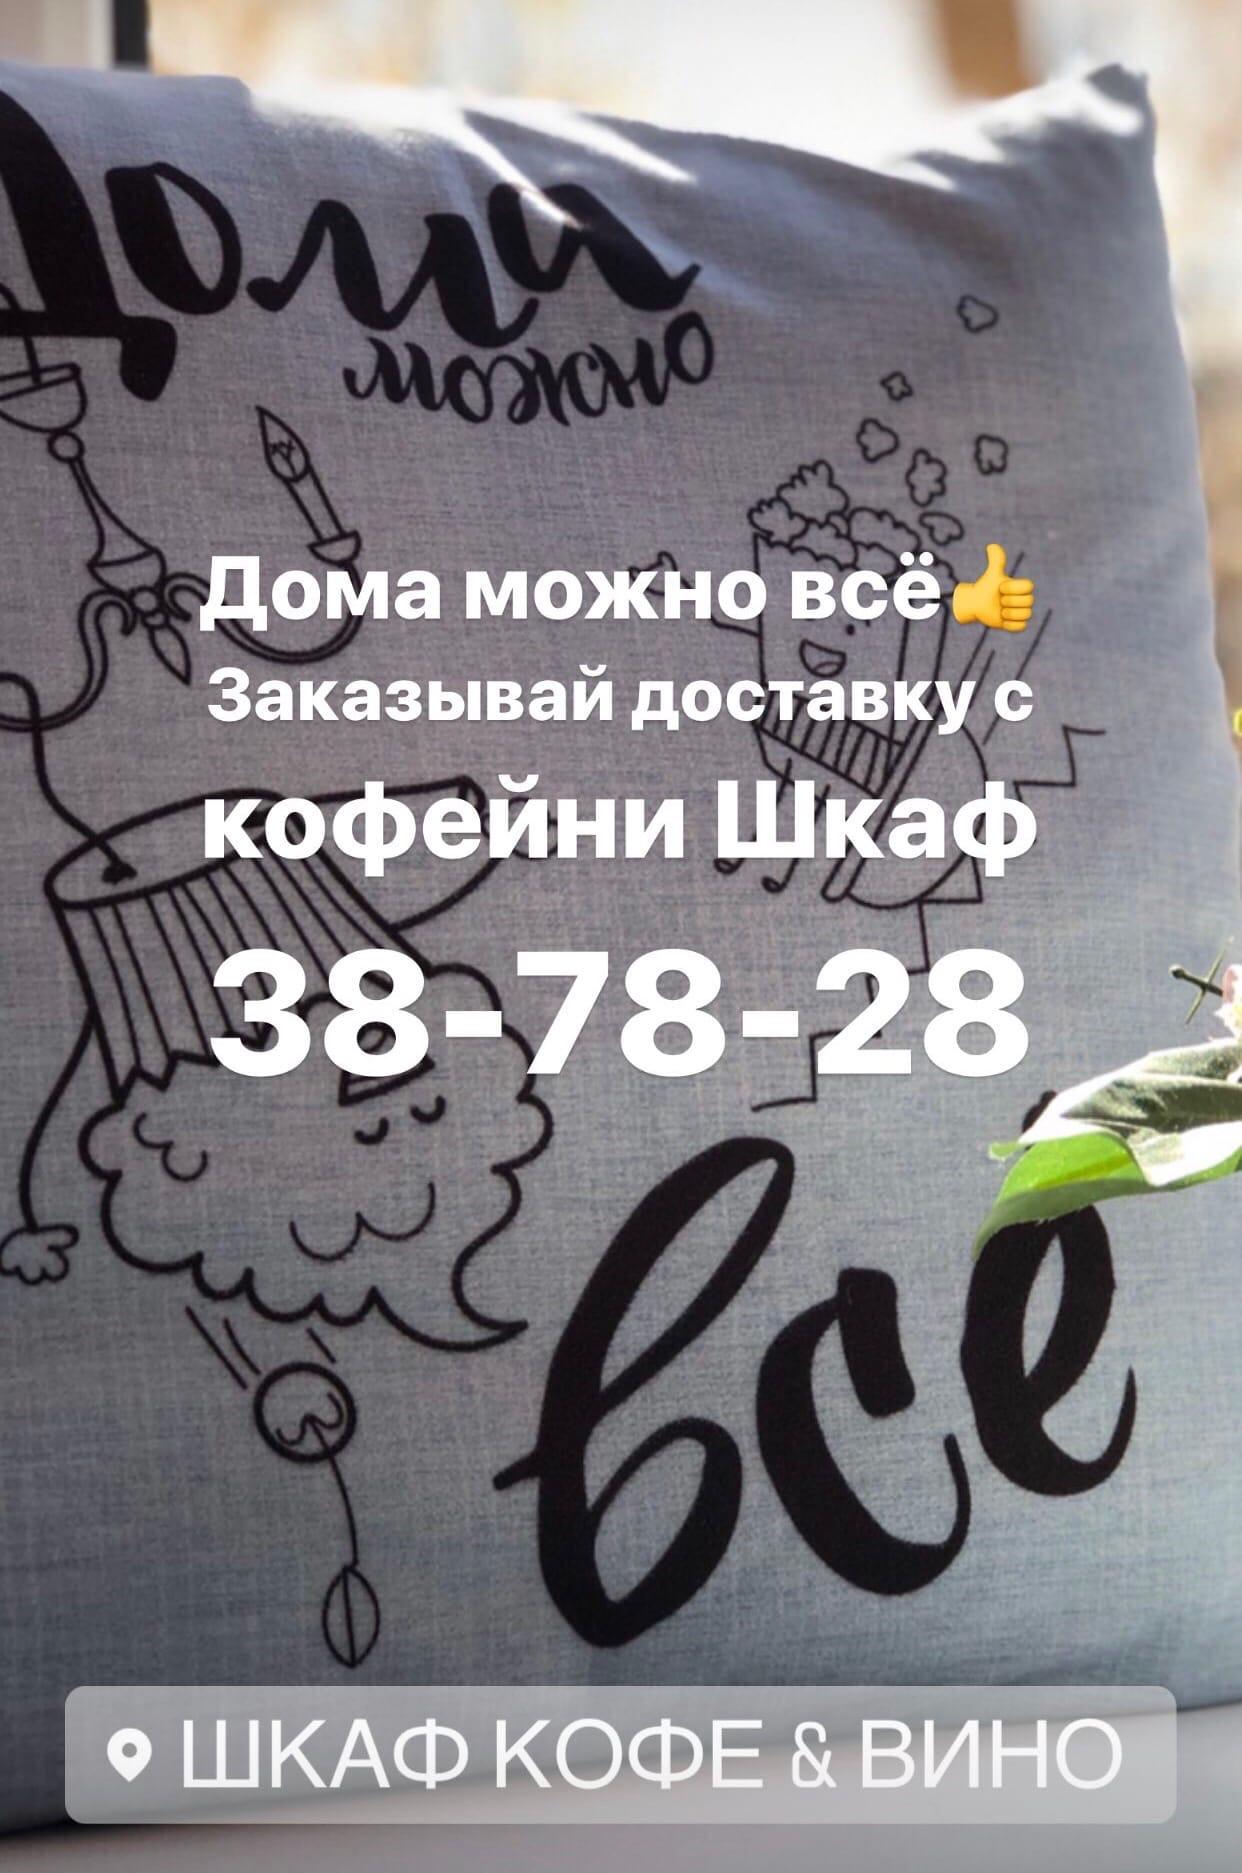 Бар, спорт-бар «Жигули» - Вконтакте